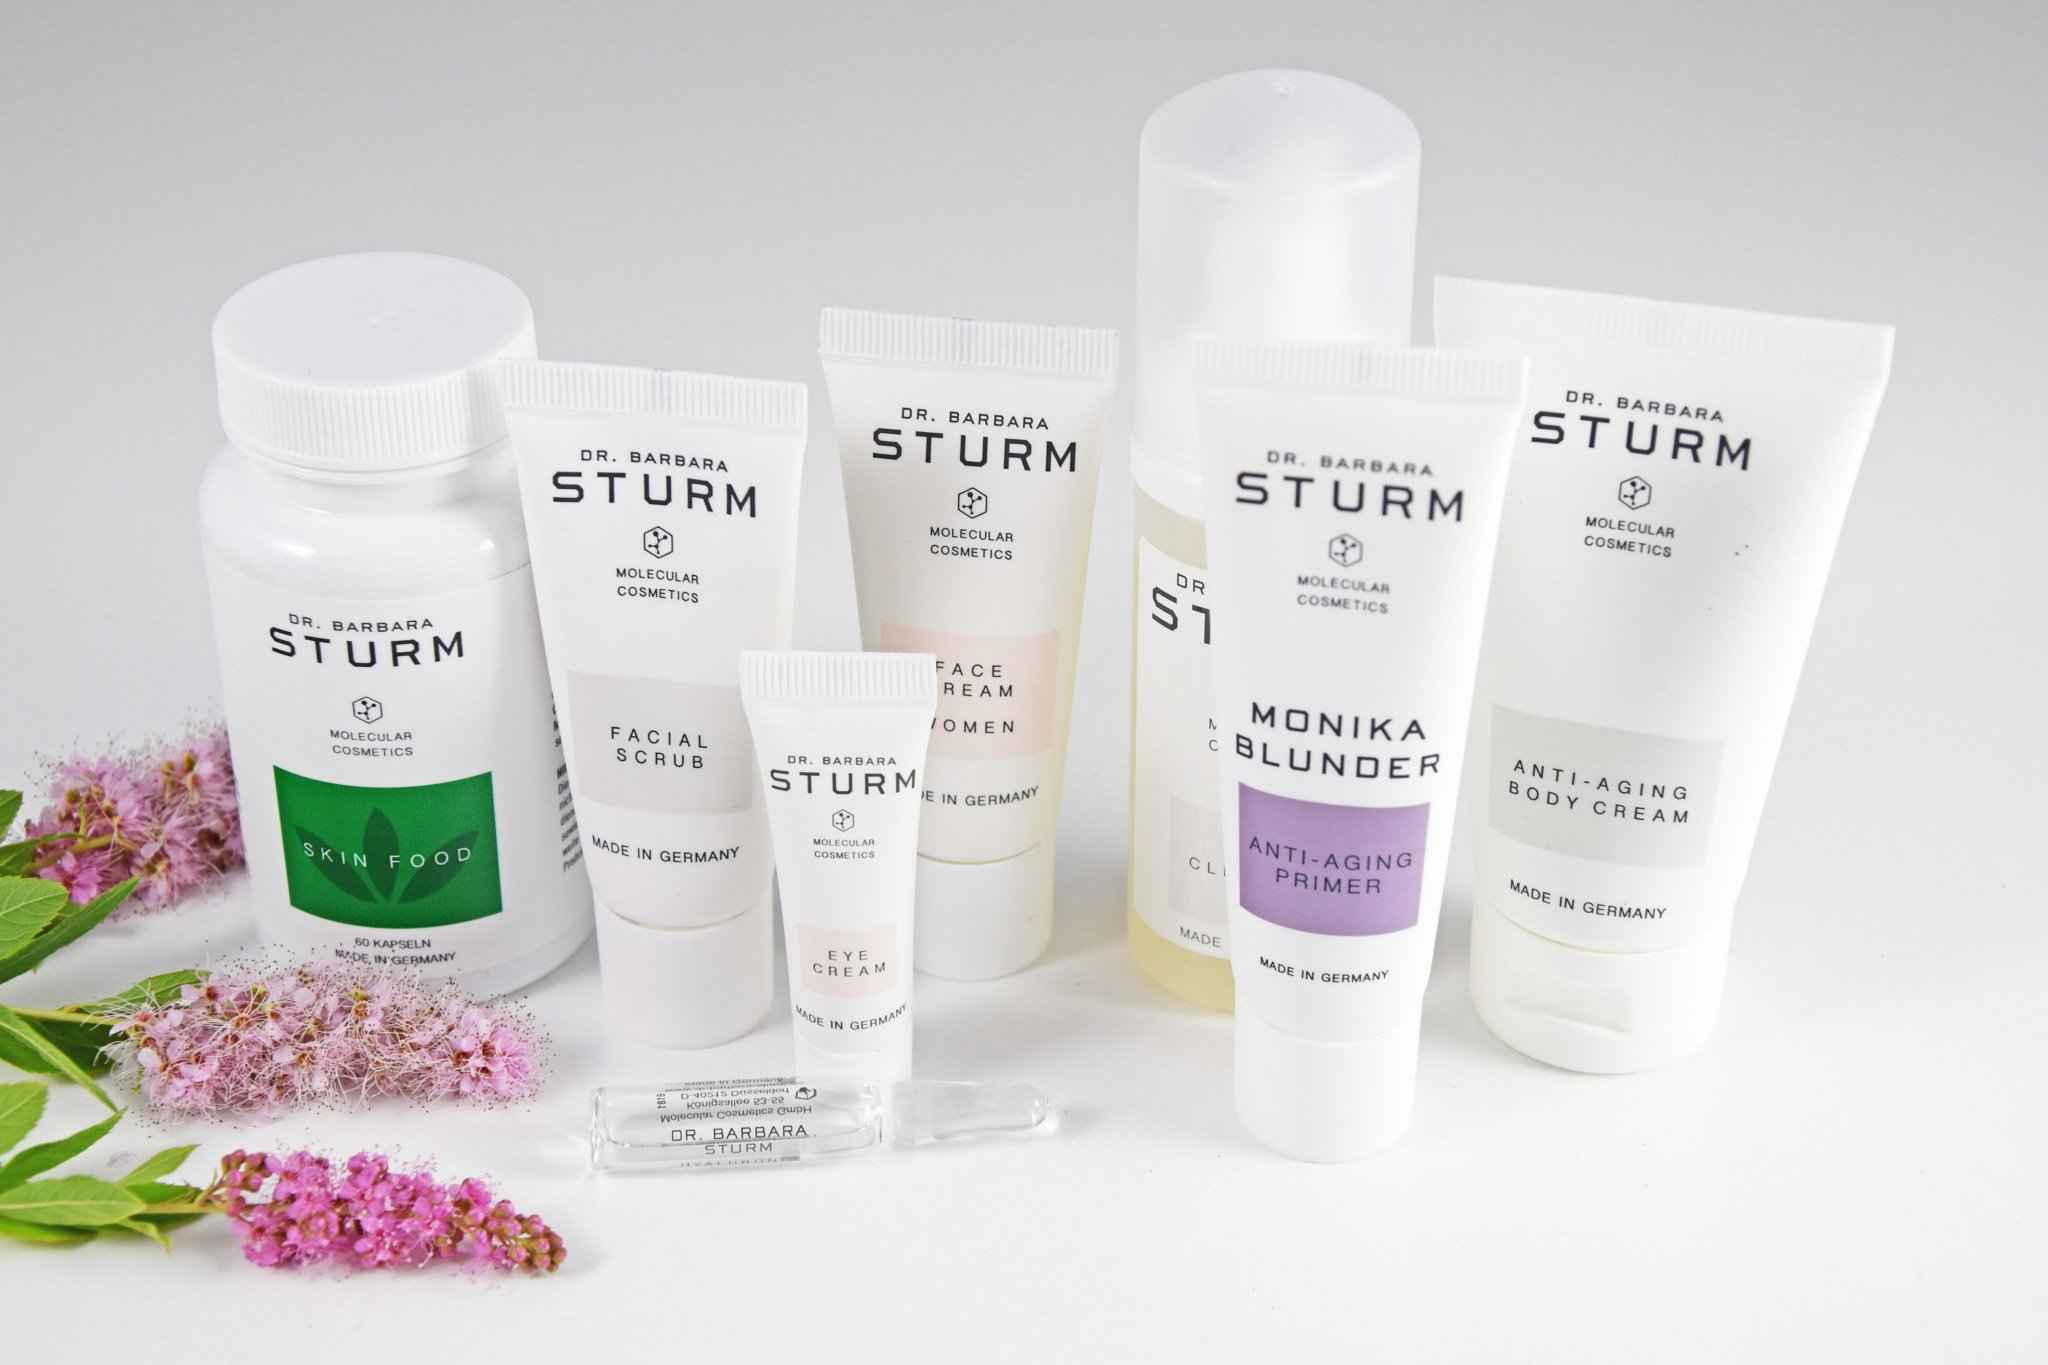 Dr. Barbara Sturm Molecular Cosmetic